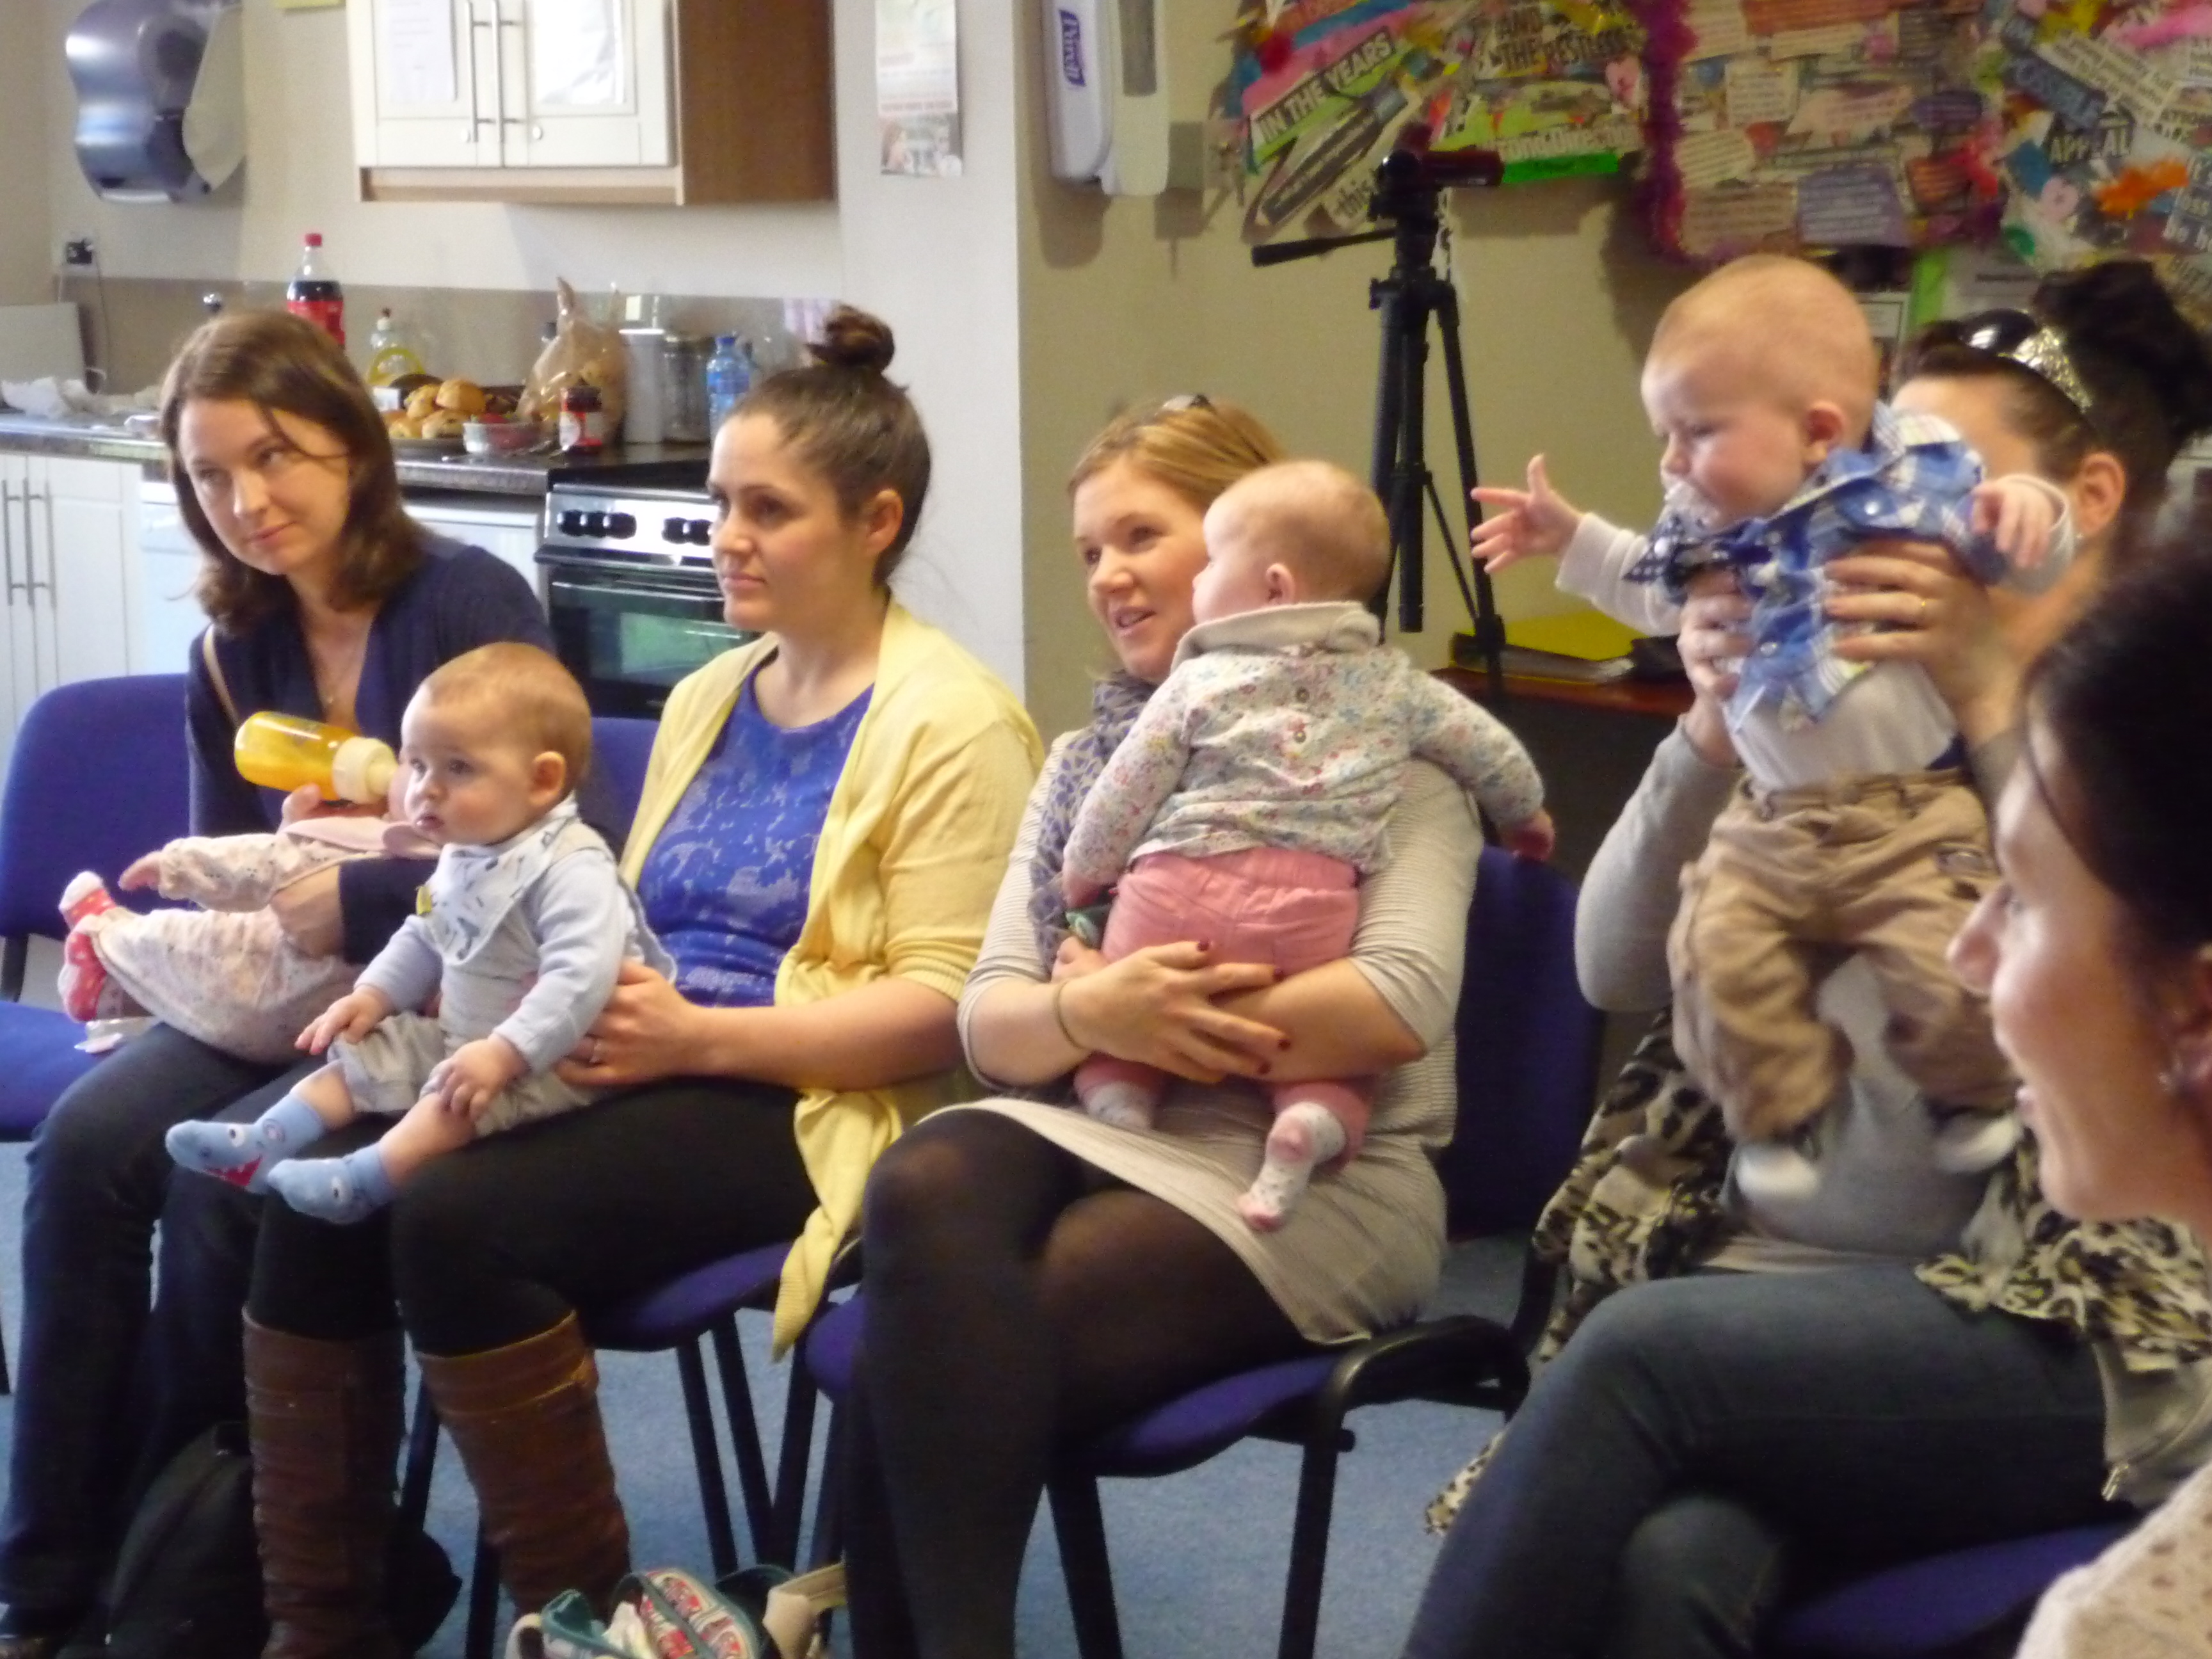 Clondalkin Blue Skies Parent Baby Programme